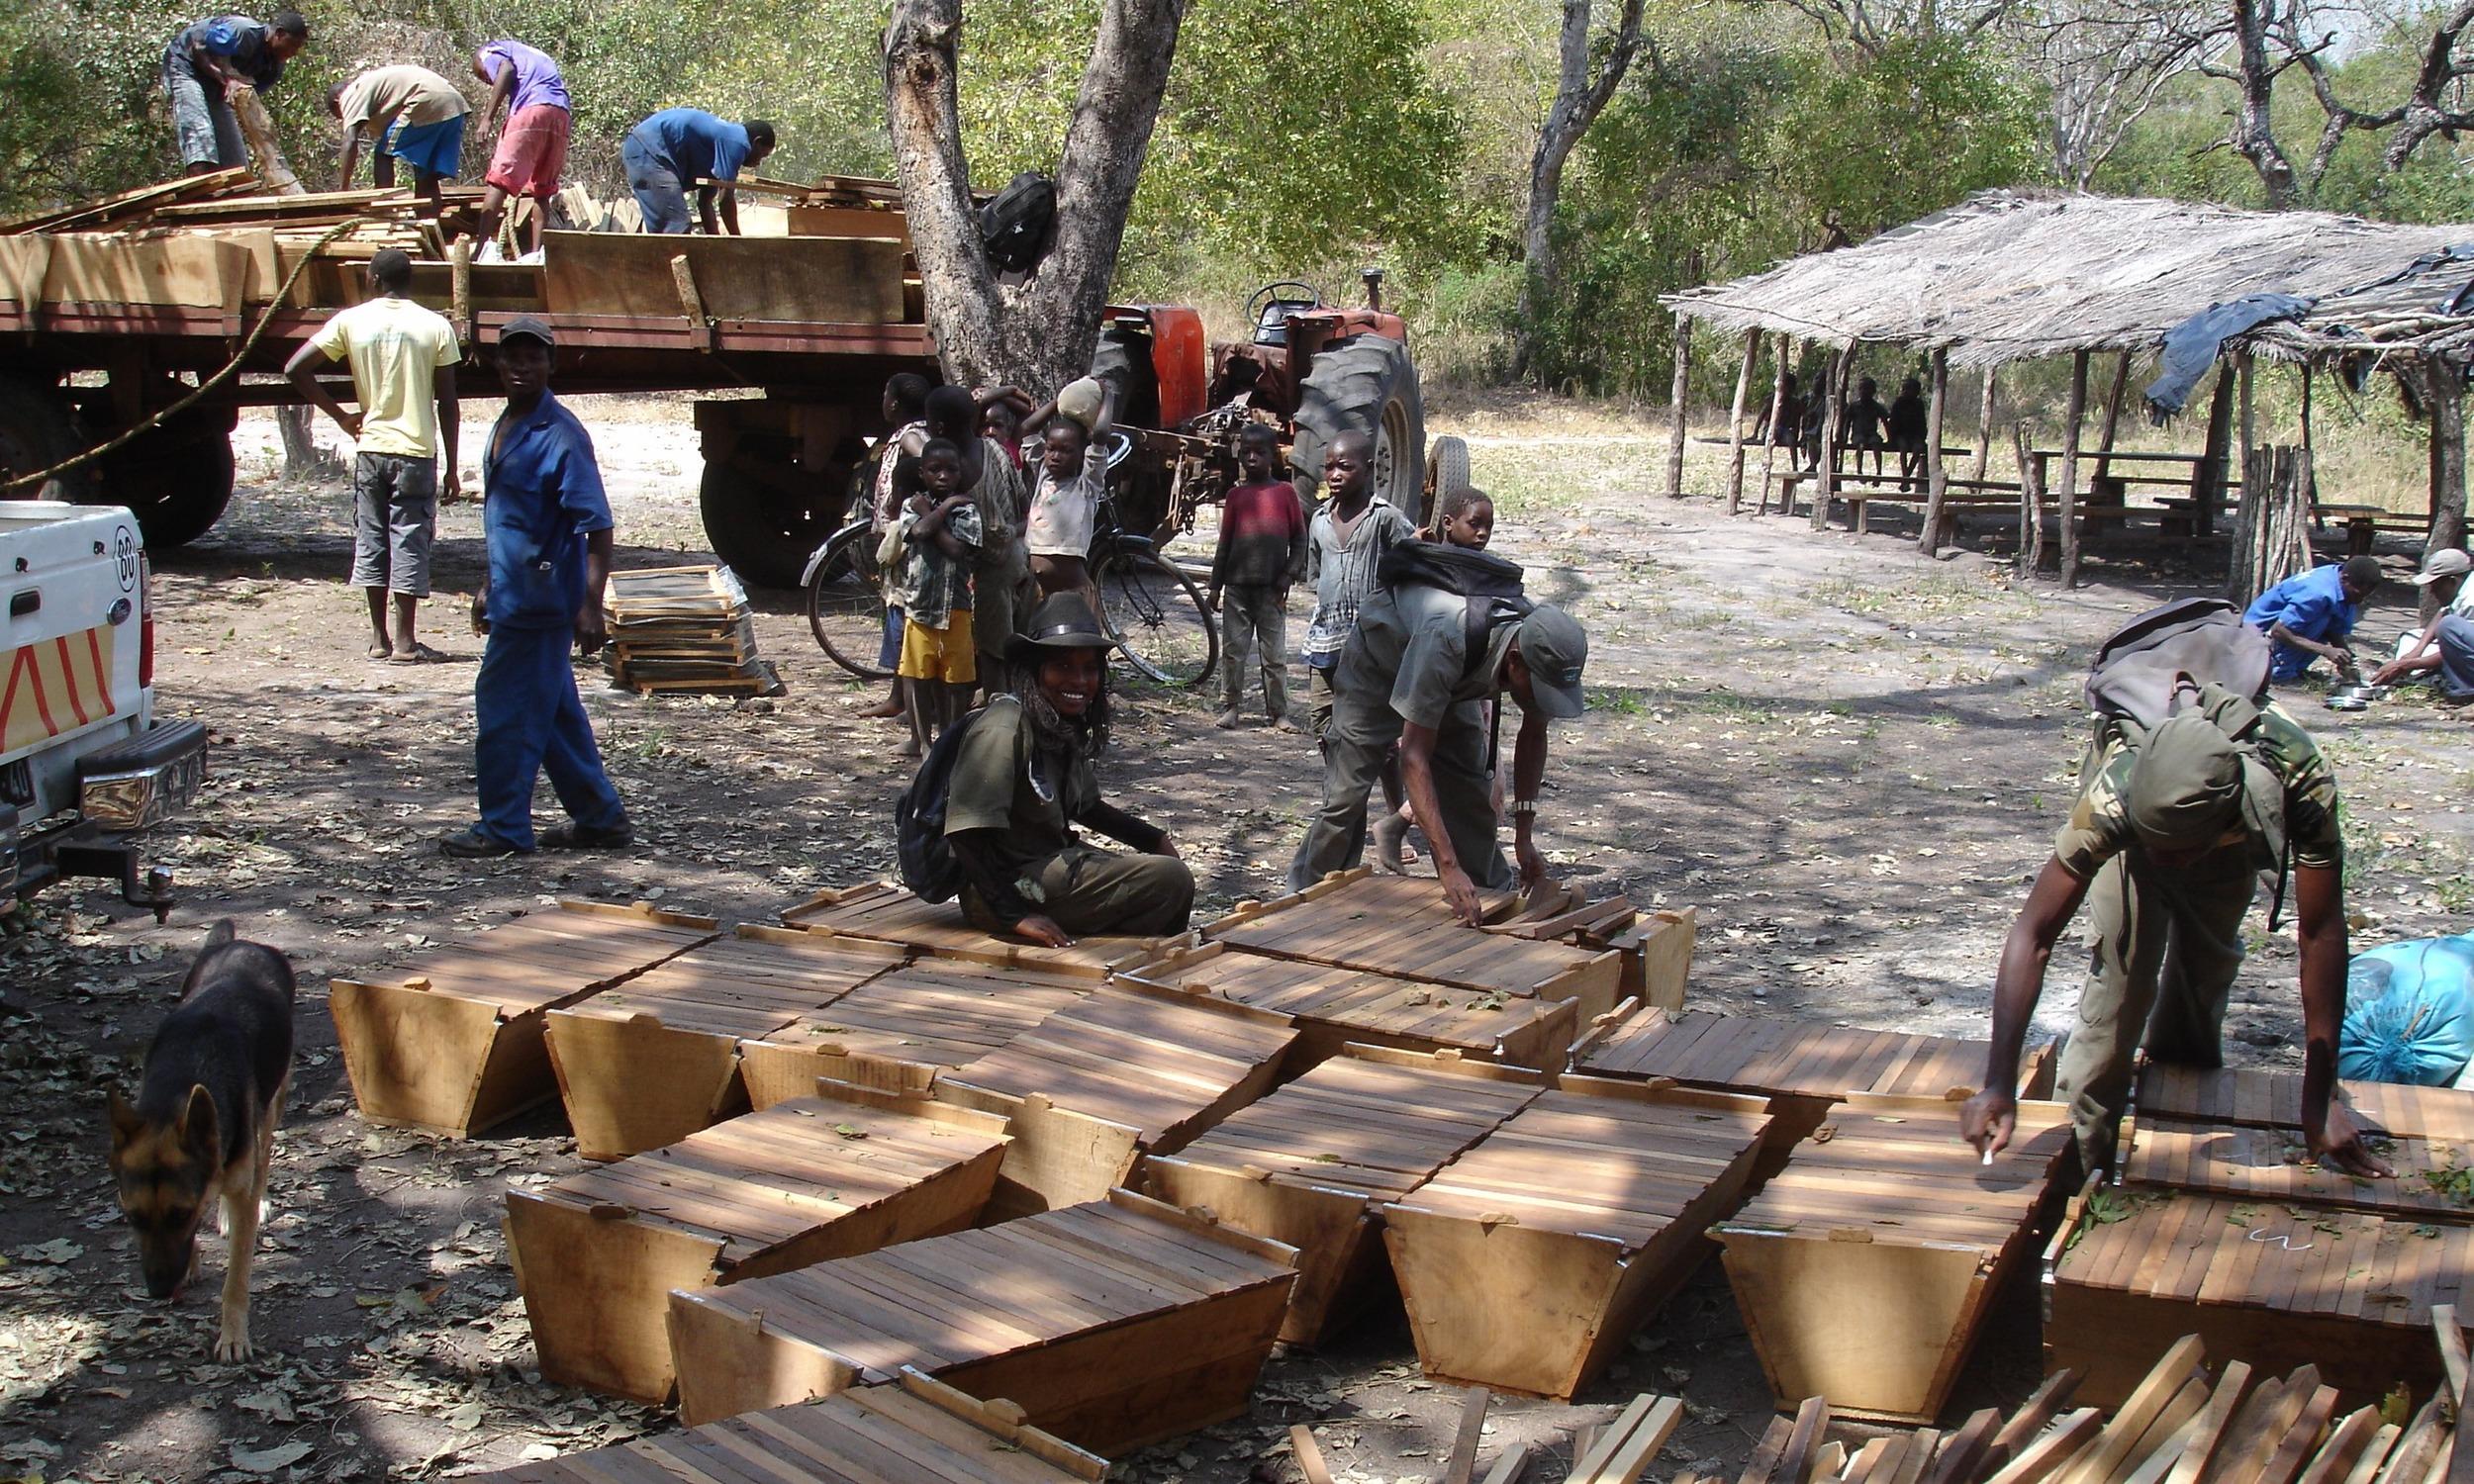 Entrega de colmeias para a comunidade  - Delivering hives to the community